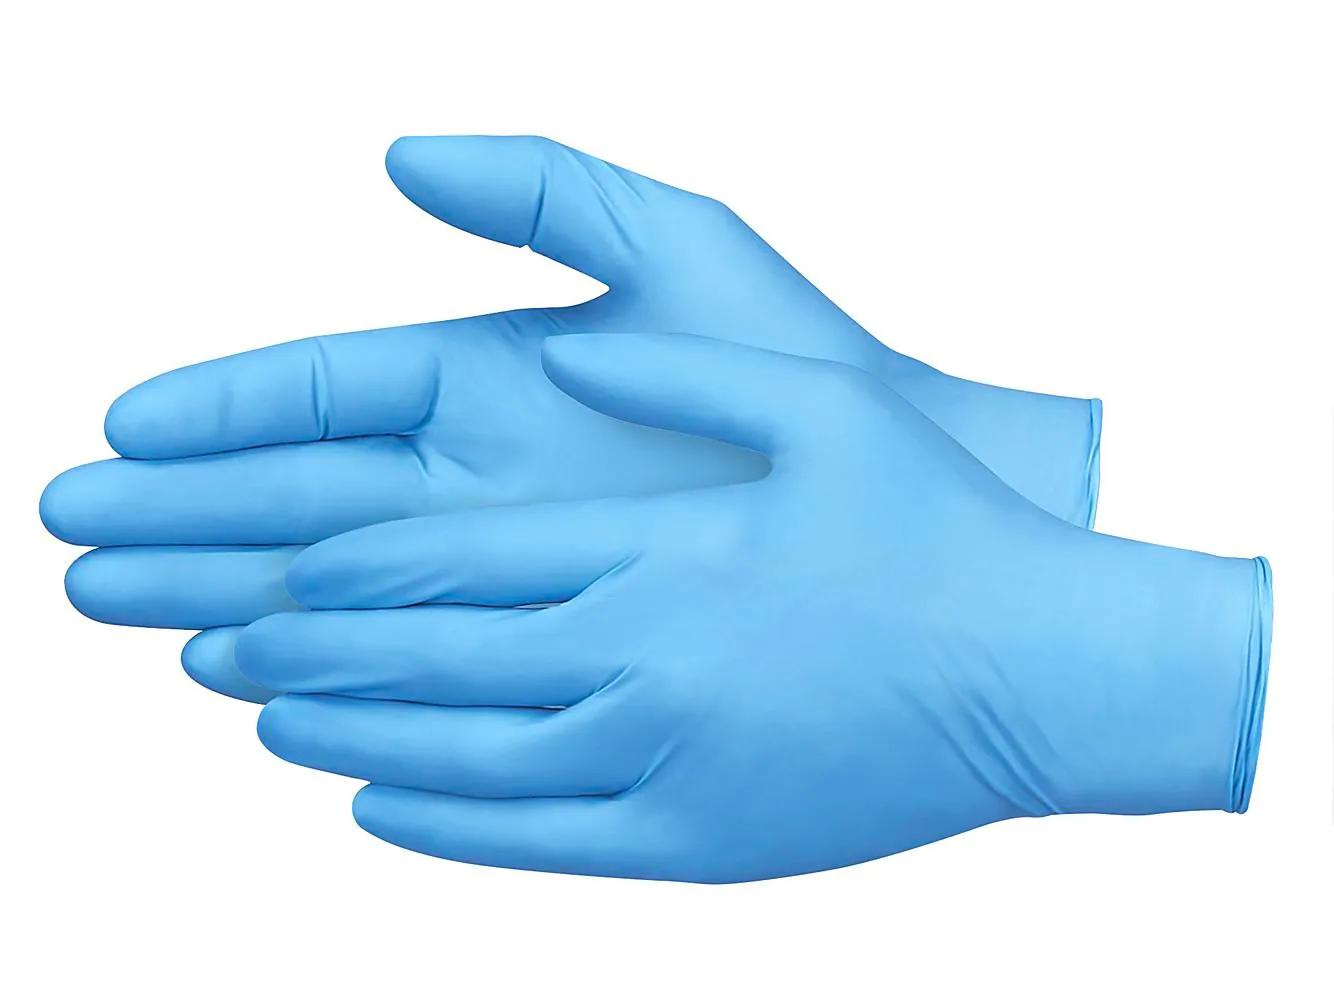 Large Non-Medical Nitrile Gloves - Blue - Pack of 100